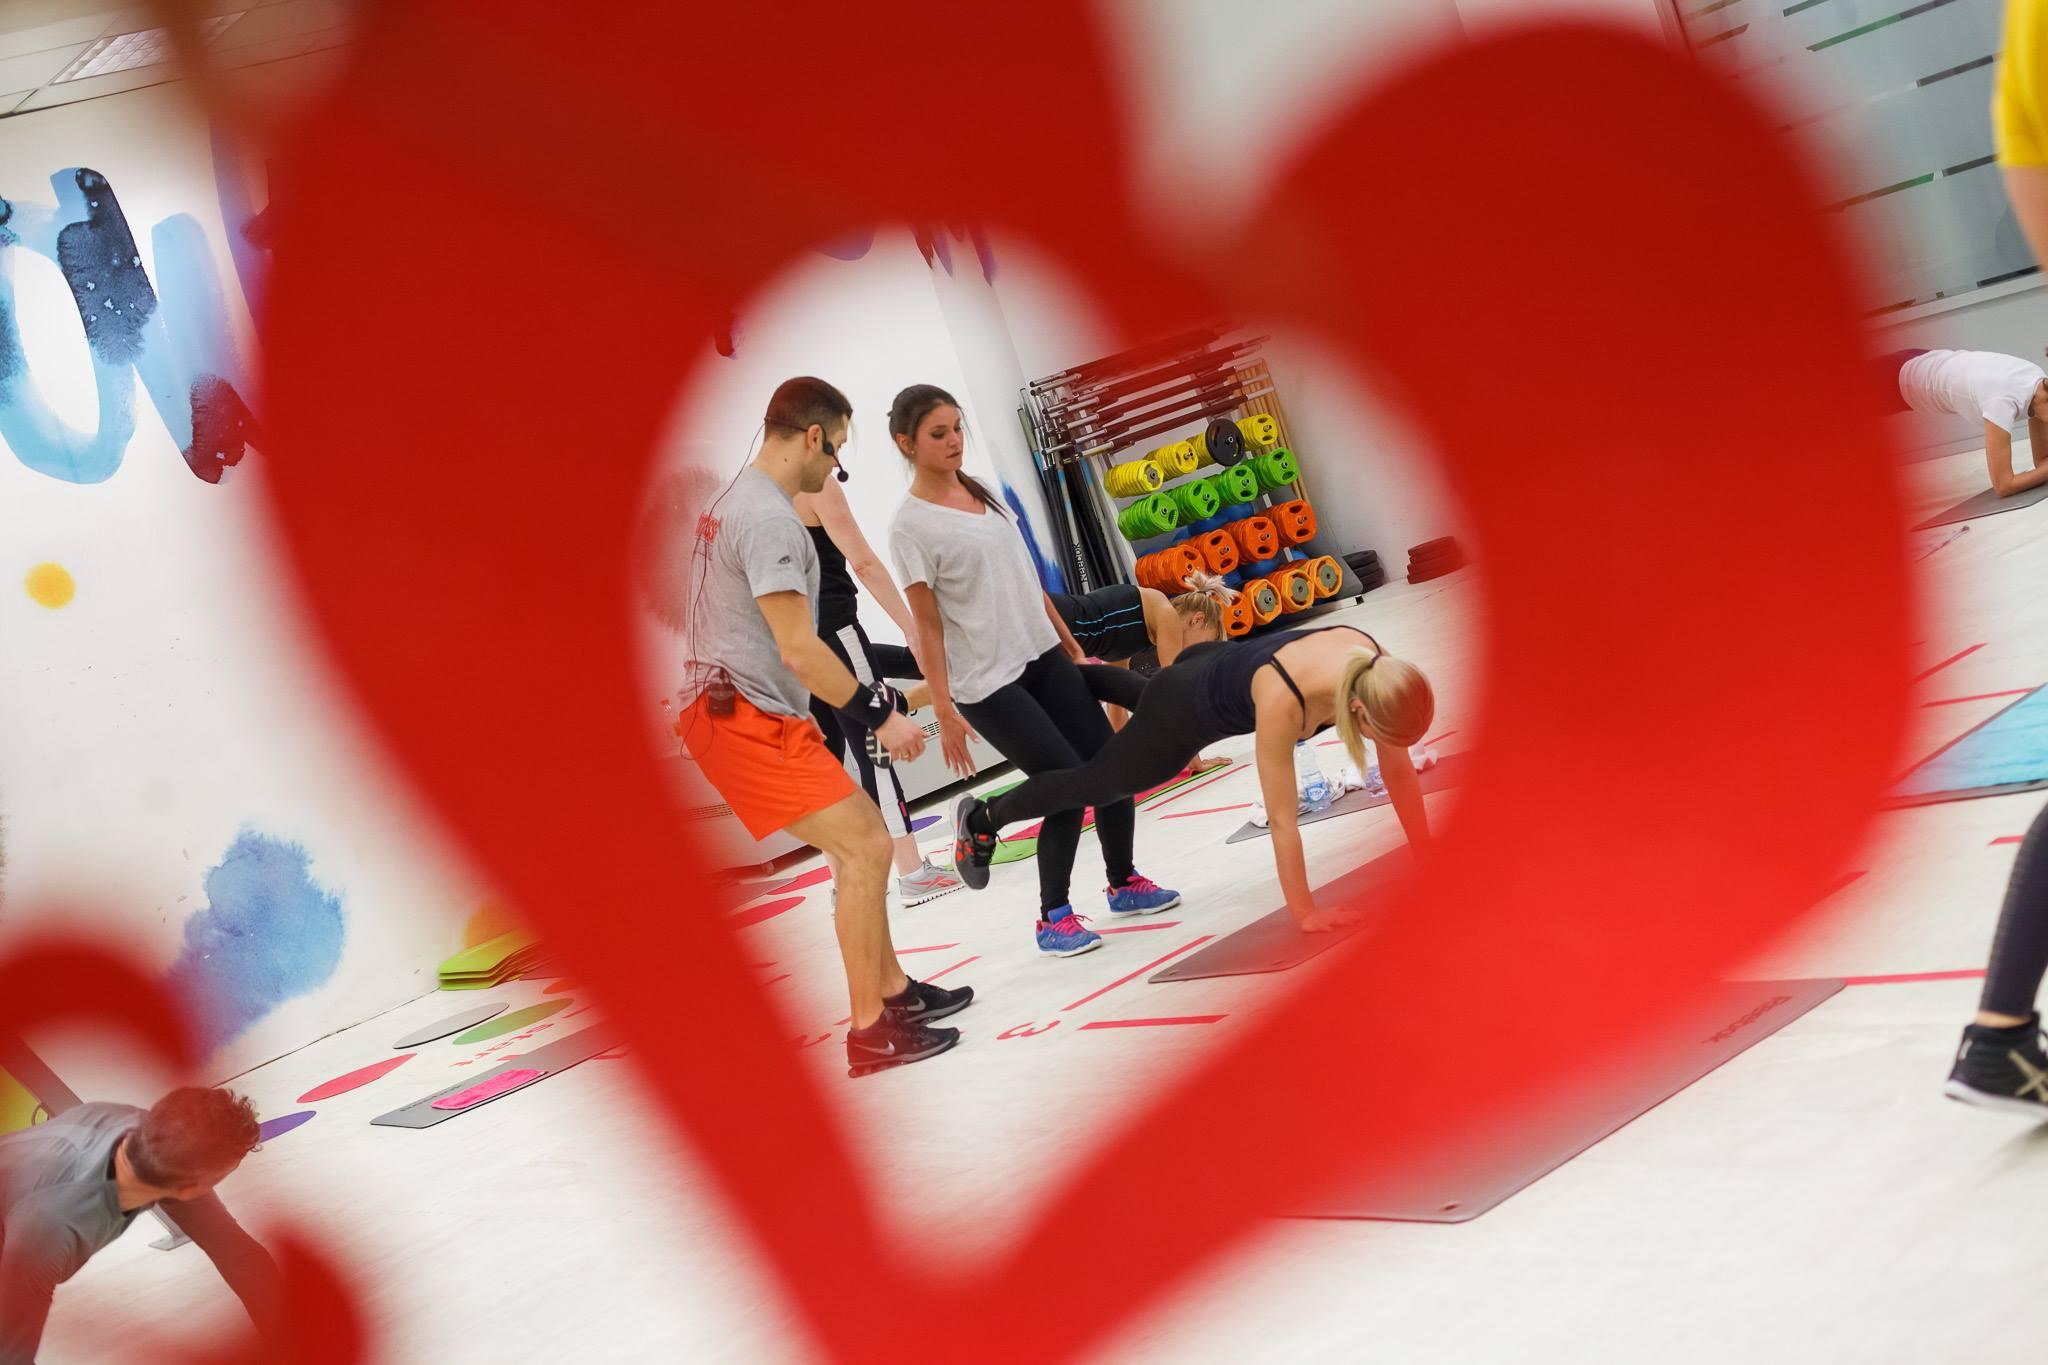 Dan ljubavi, vina i treninga | 14. Februar